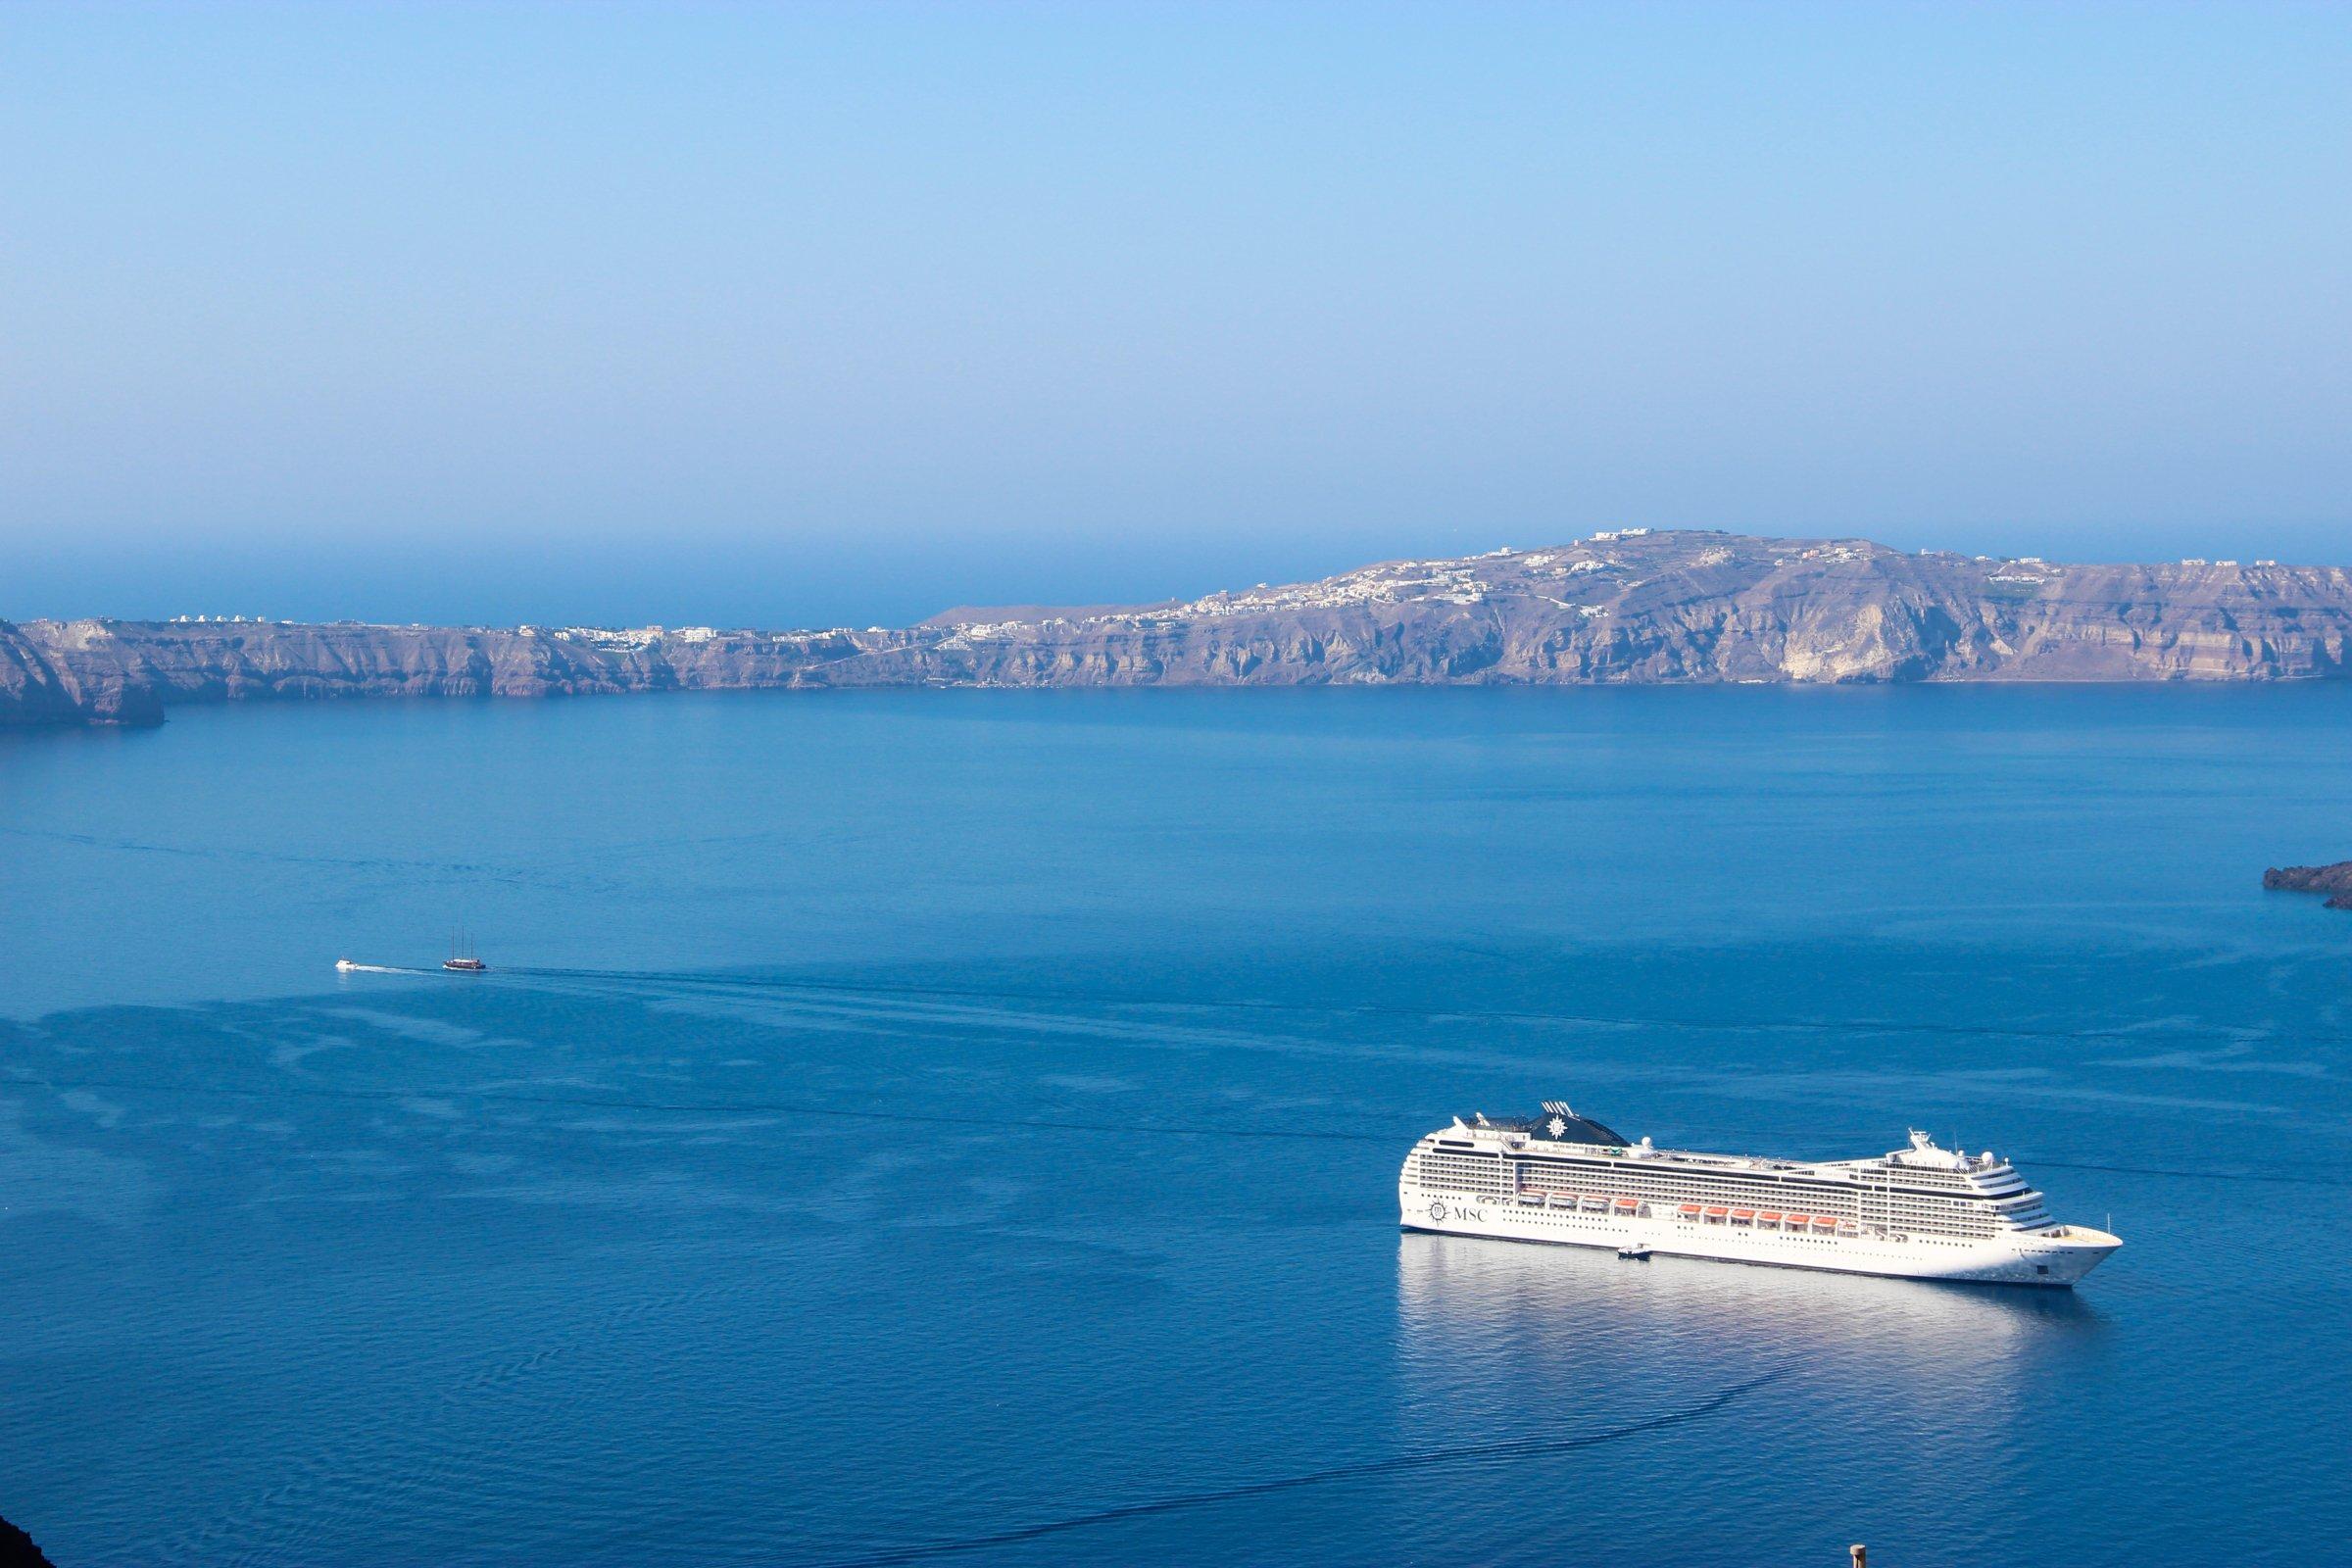 Cruise Ship In Ocean With Rock Island